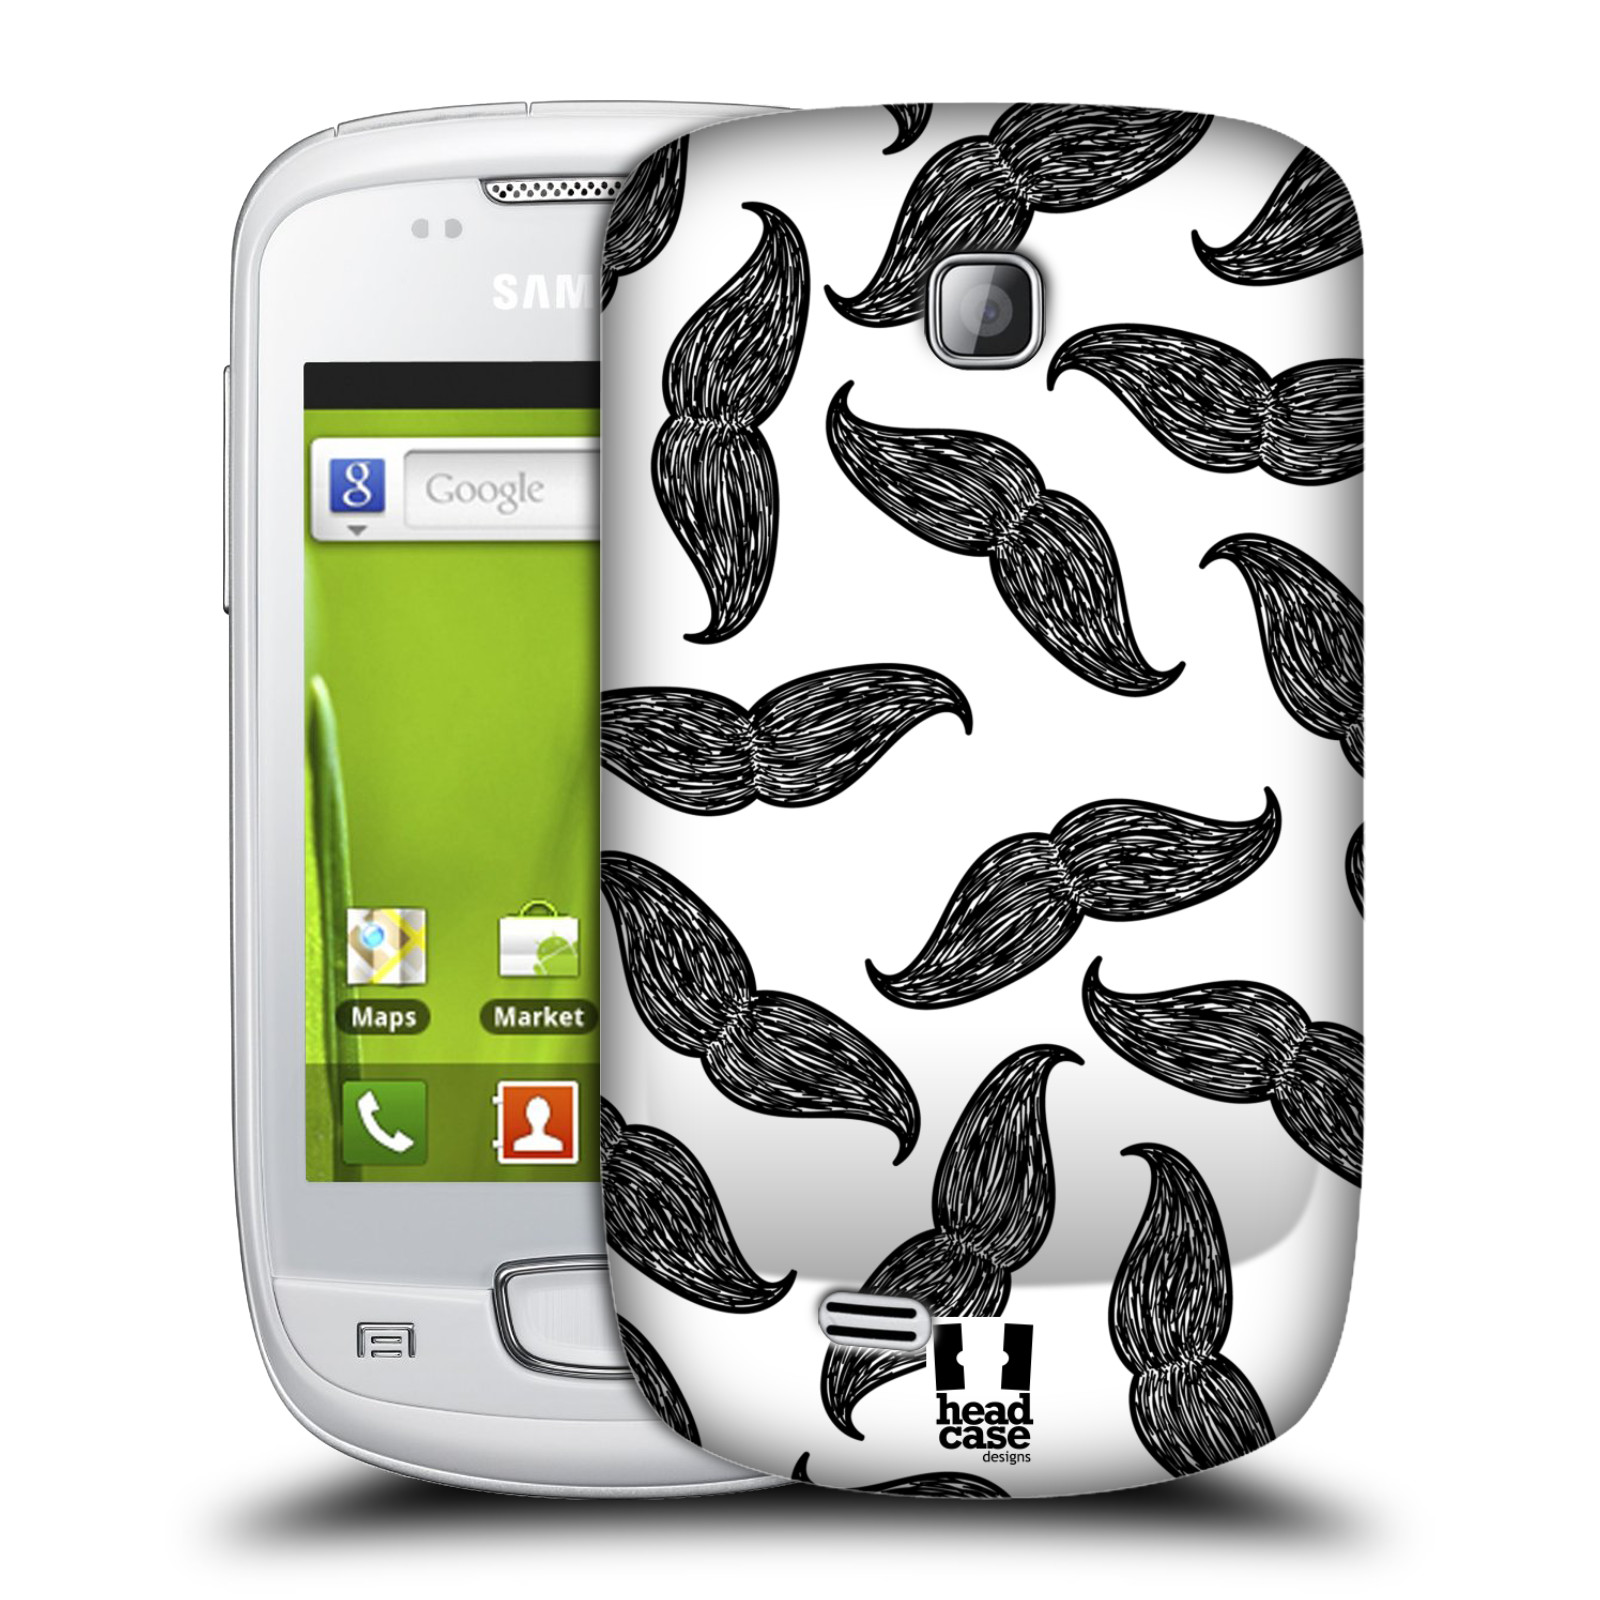 Plastové pouzdro na mobil Samsung Galaxy Mini HEAD CASE HIPSTER KNÍRY (Kryt či obal na mobilní telefon Samsung Galaxy Mini GT-S5570 / GT-S5570i)